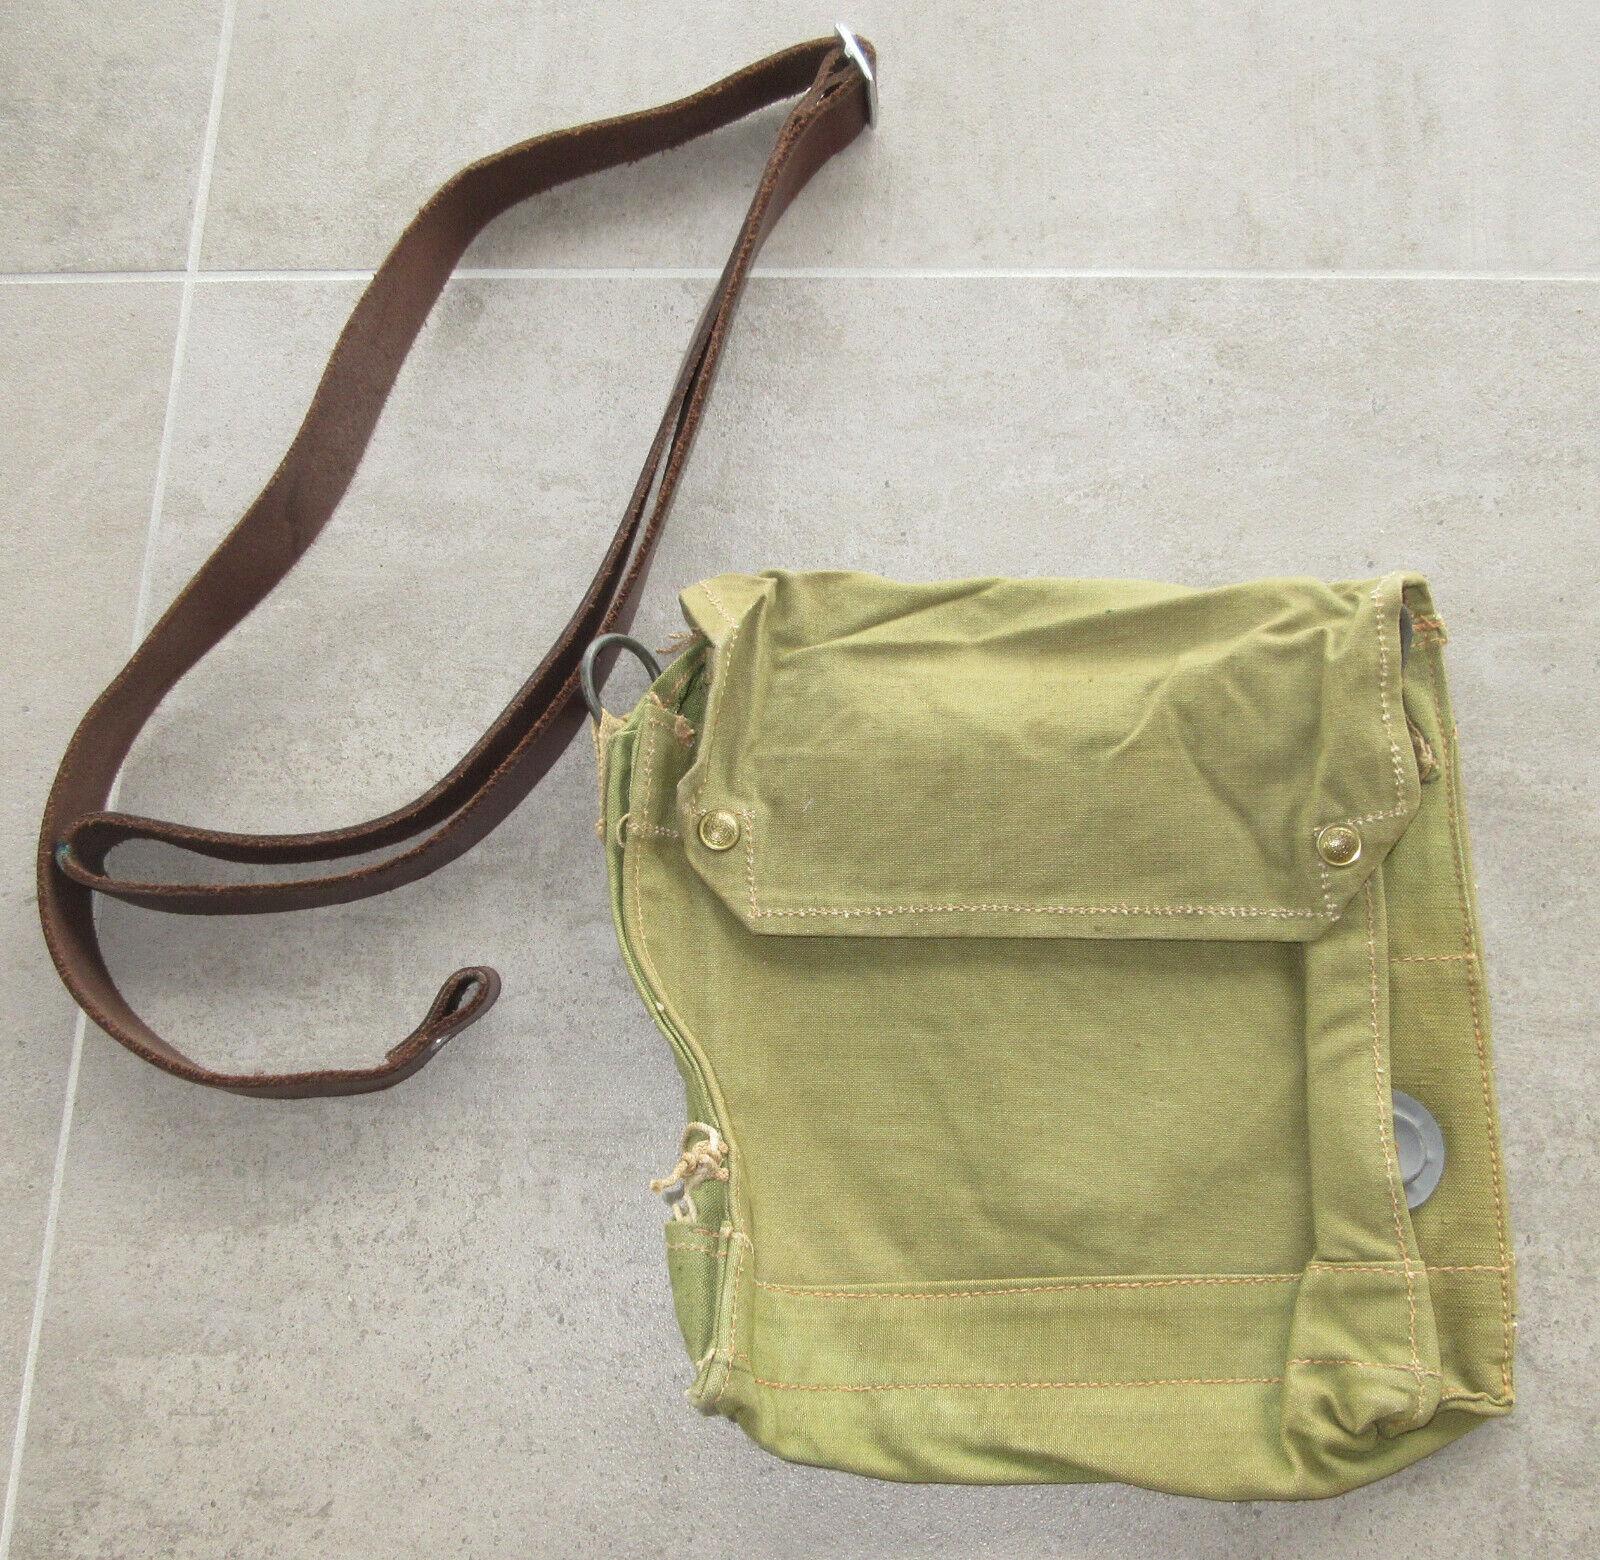 INDIANA JONES Sacoche British bag WW2 Original Respirator Bag Canvas Militaria